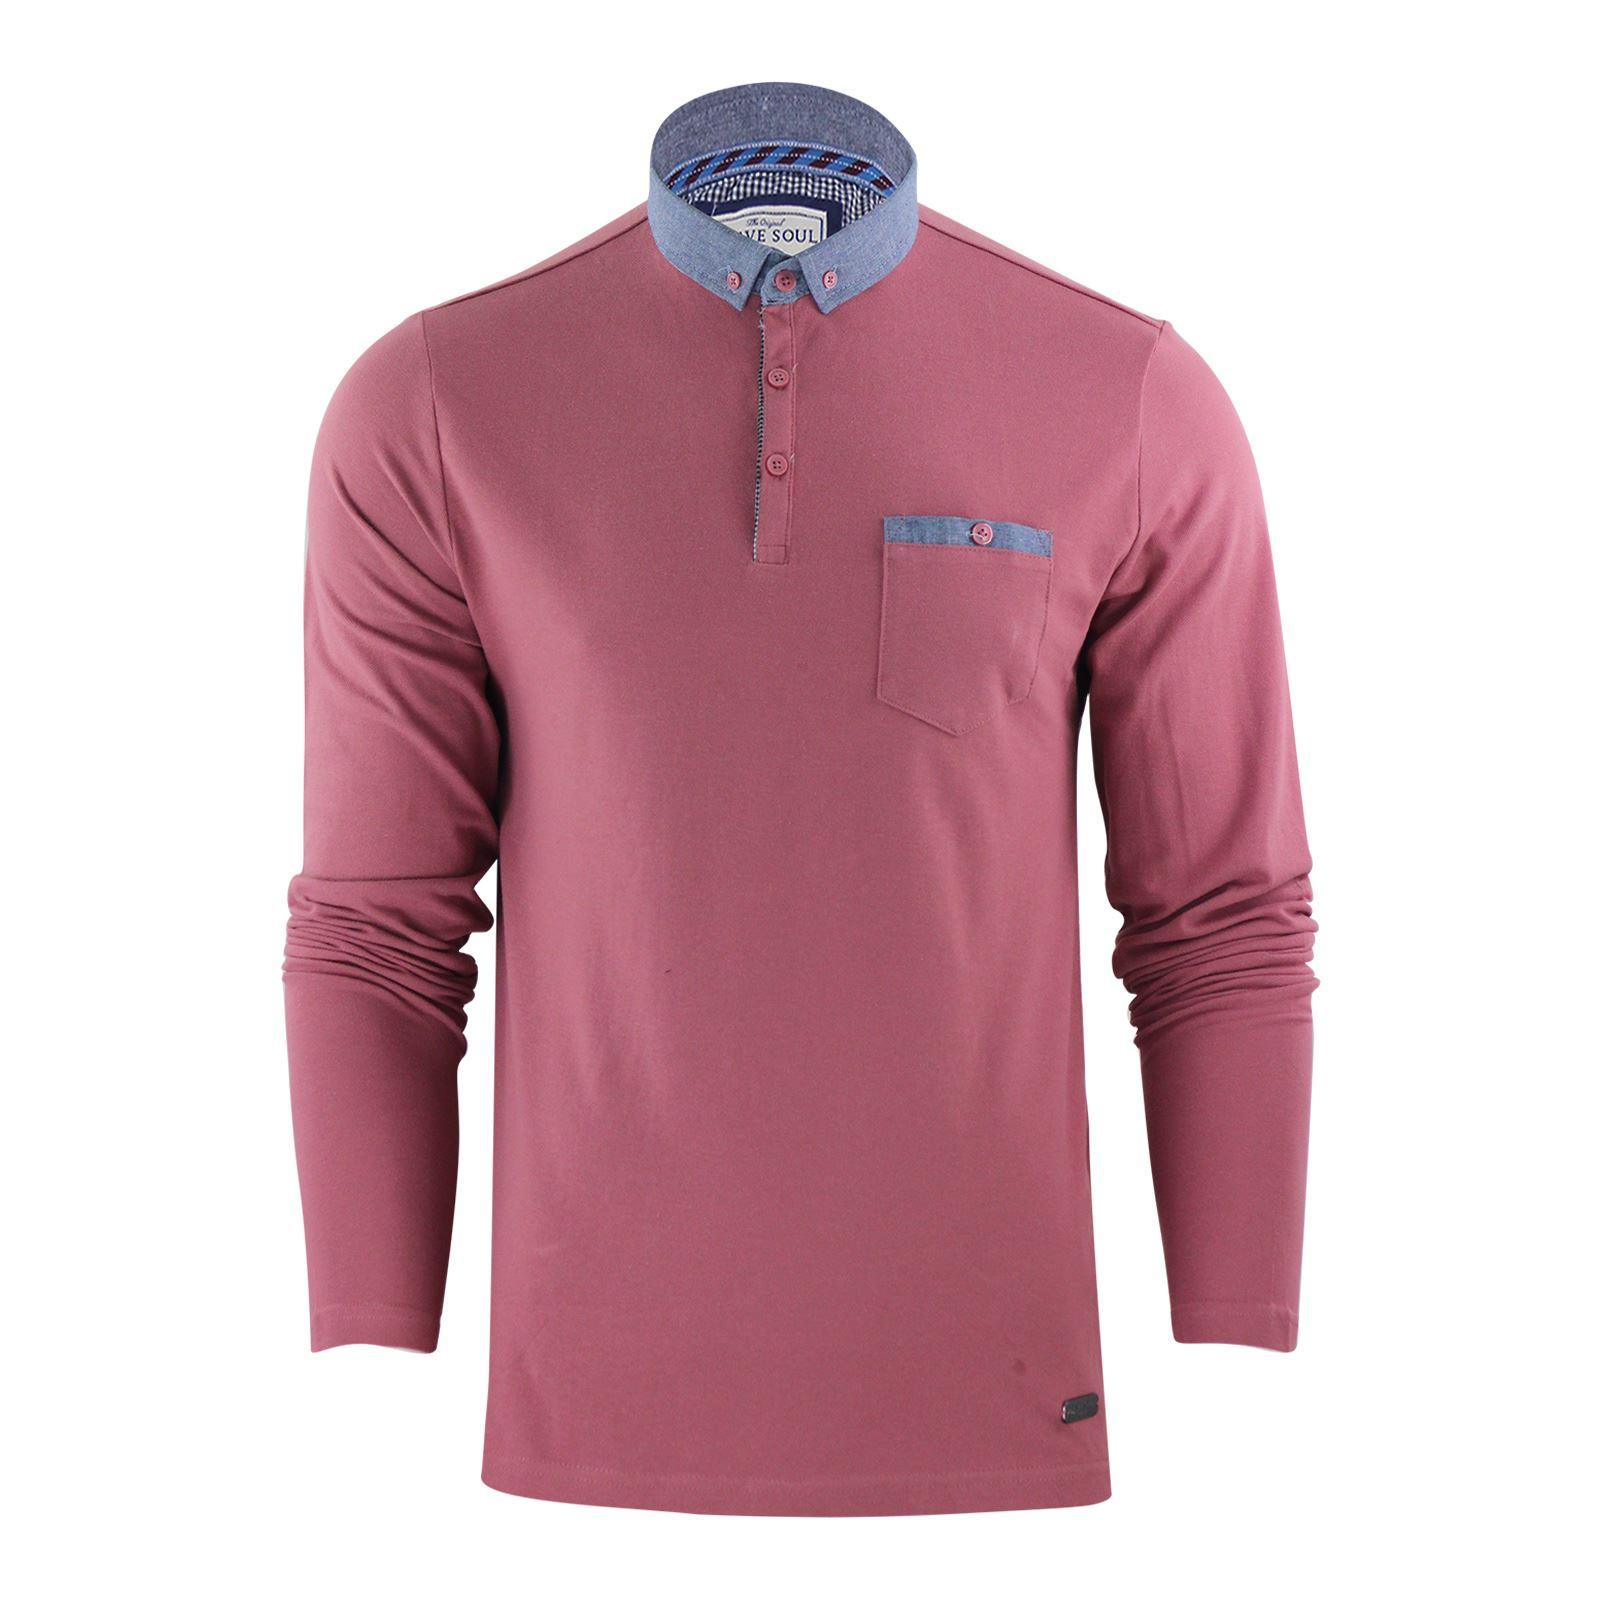 Para-Hombre-Polo-T-Shirt-Alma-valiente-Hera-Manga-Larga-De-Algodon-Casual-Top miniatura 20